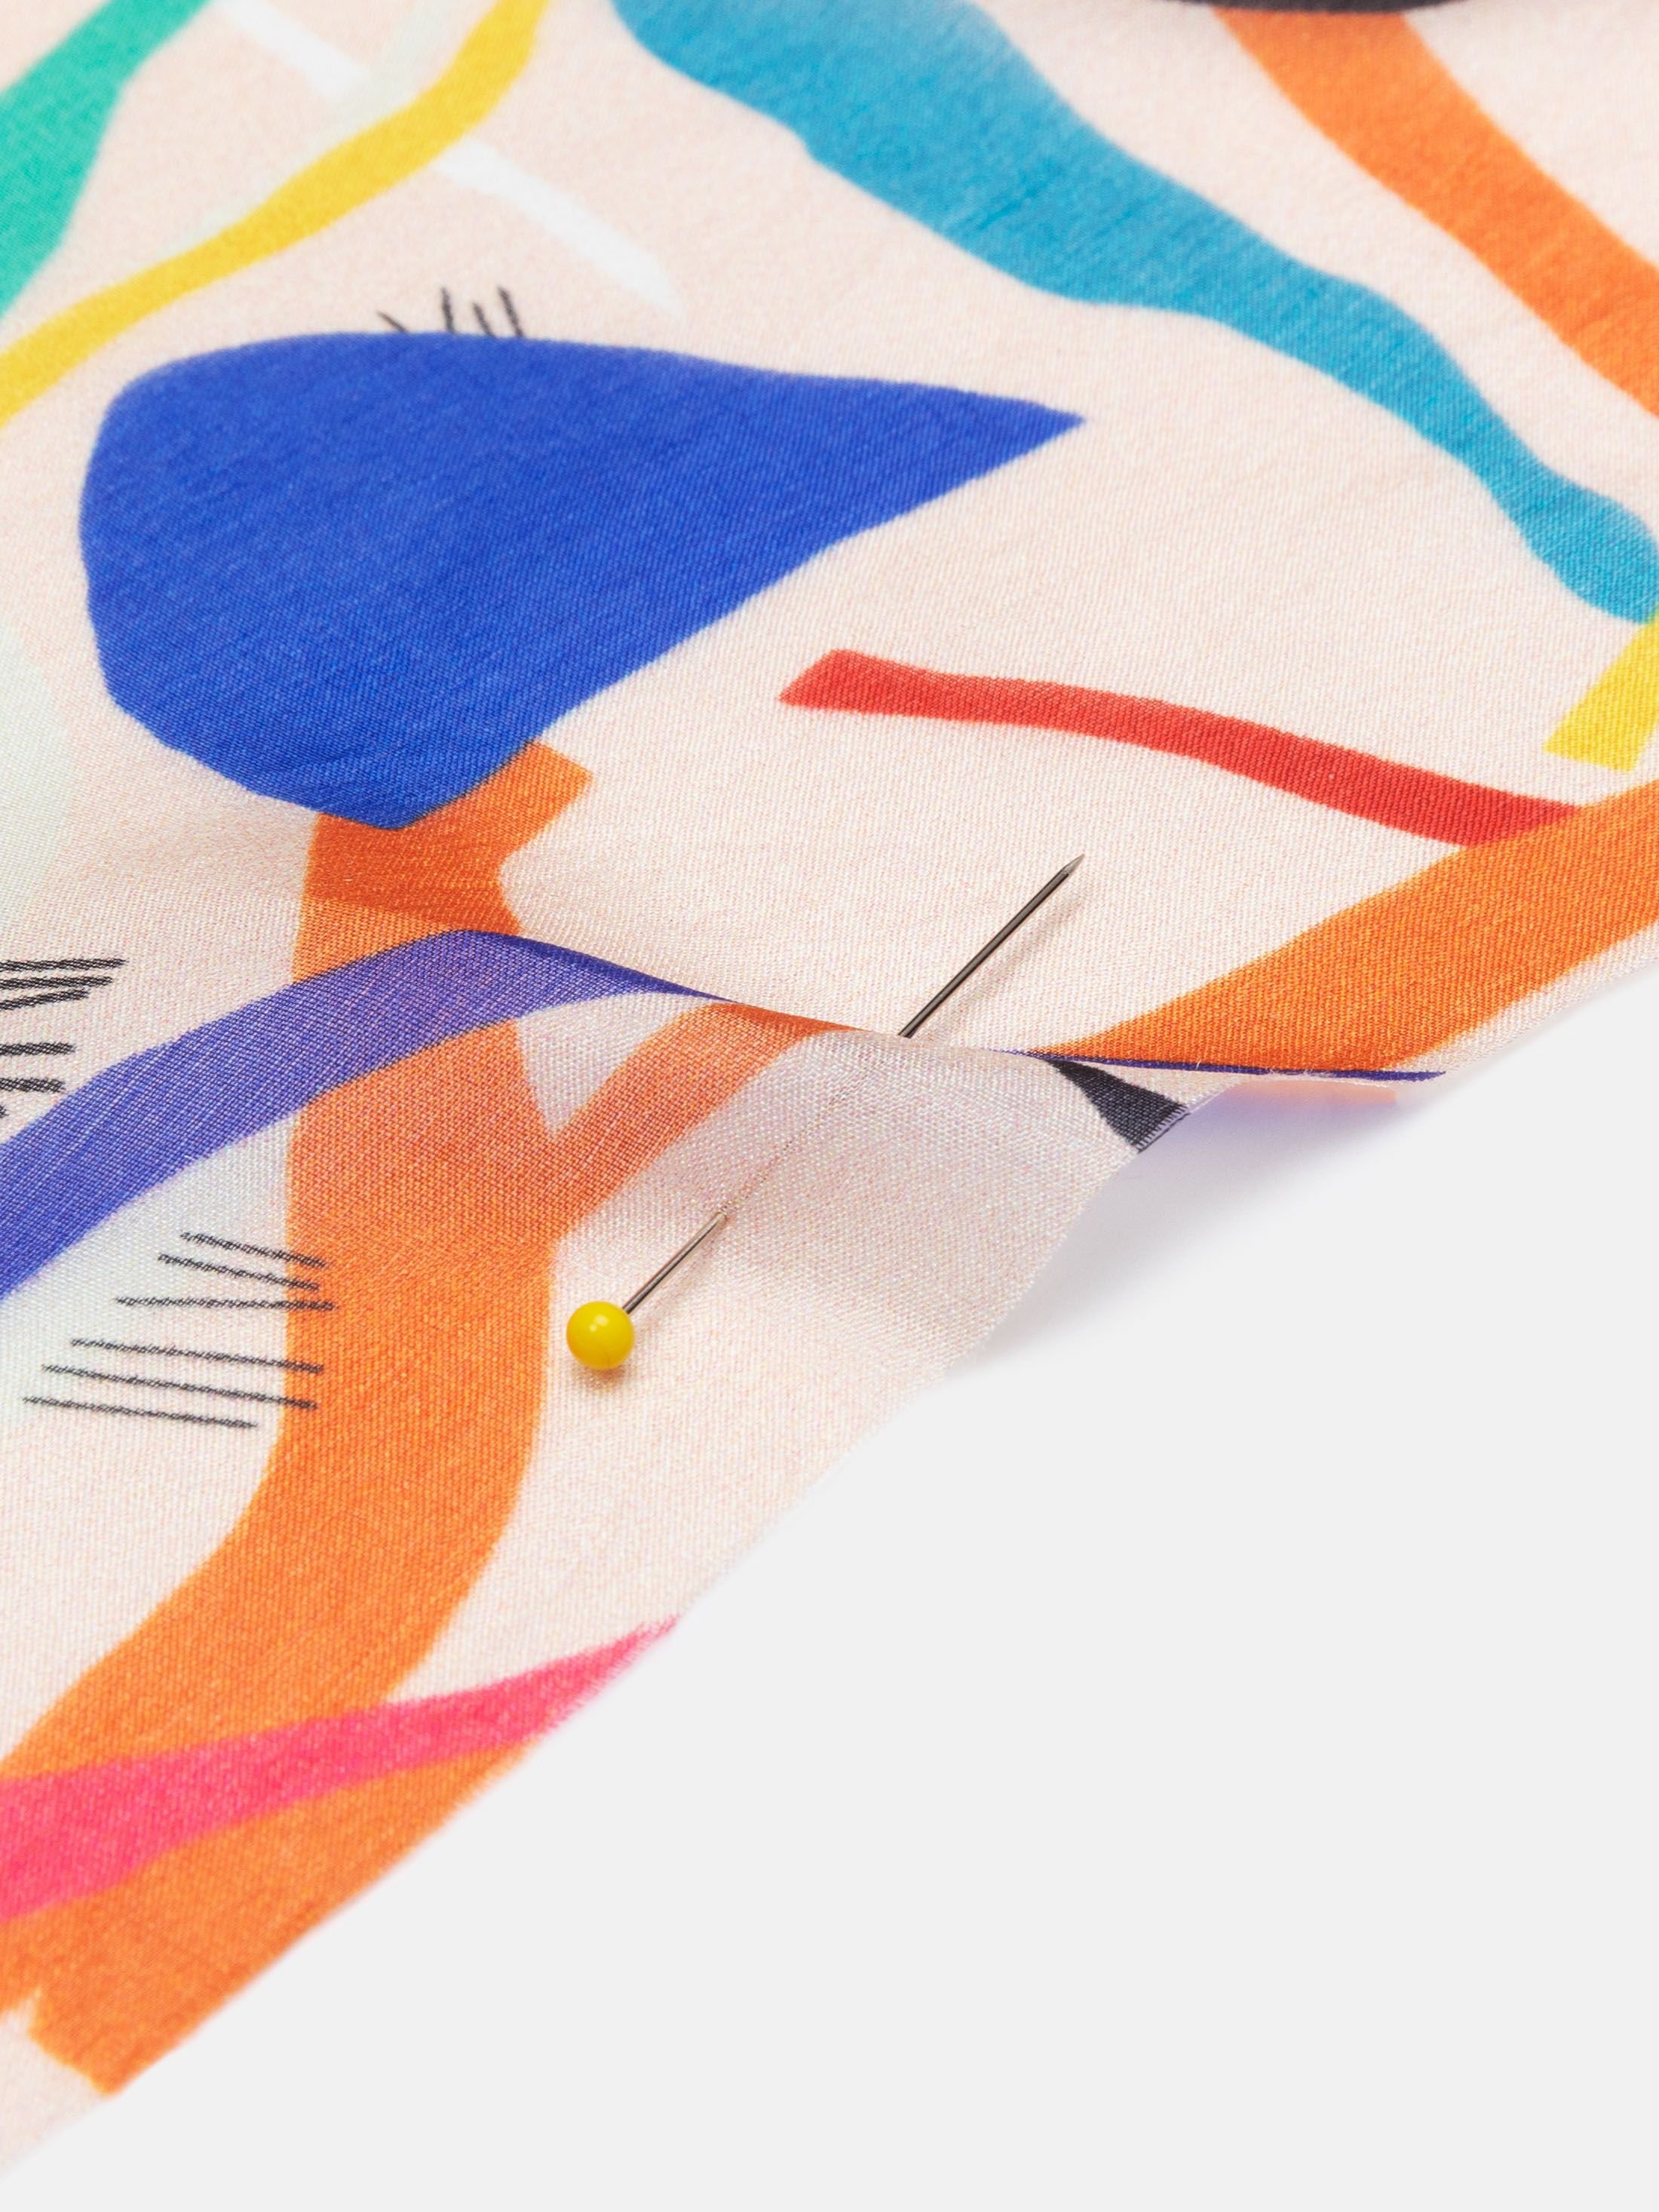 Seidenponge mit eigenem Design bedrucken